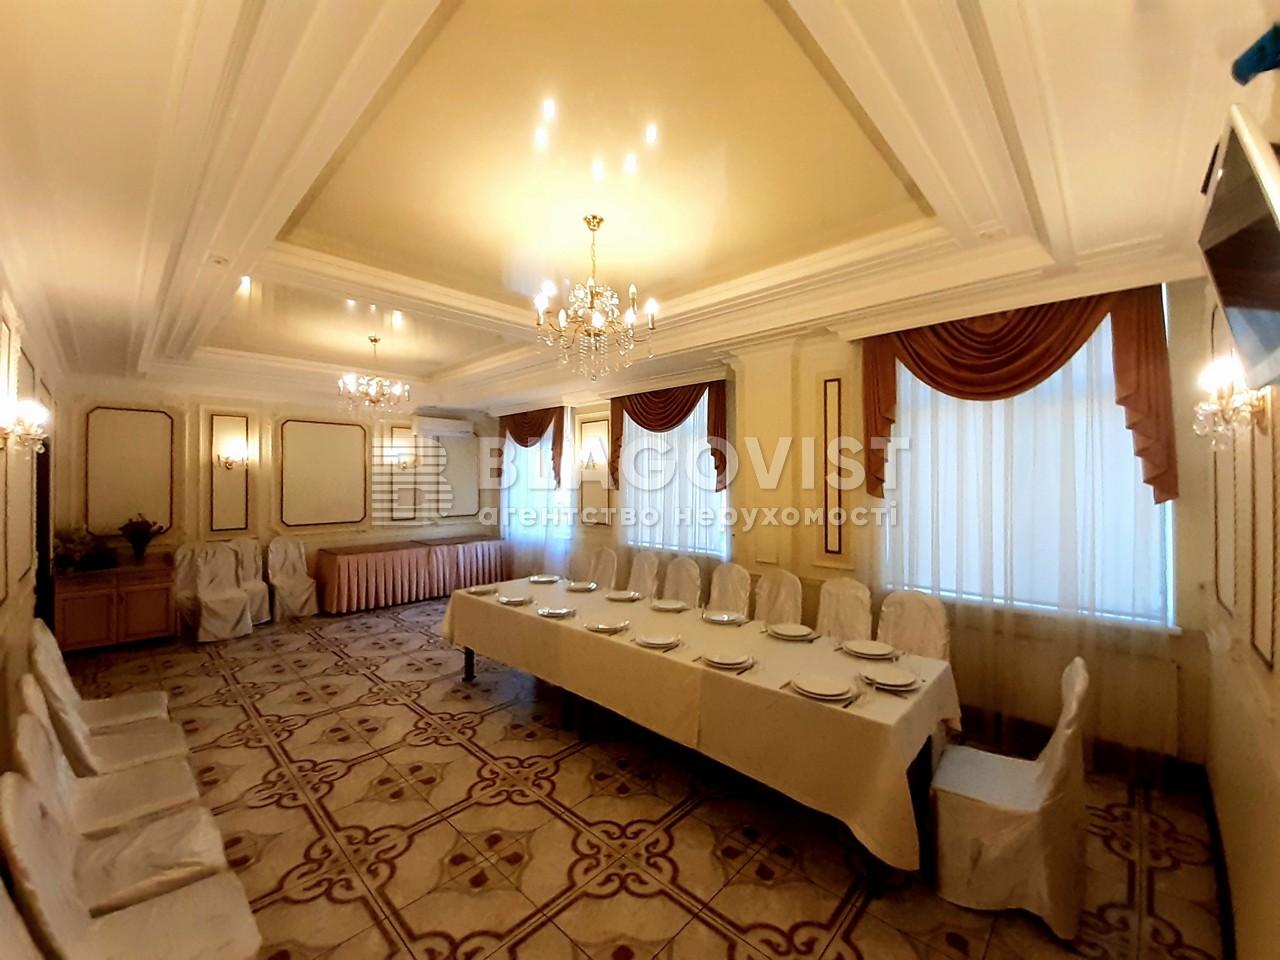 Ресторан, H-44648, Чаадаева Петра, Киев - Фото 8